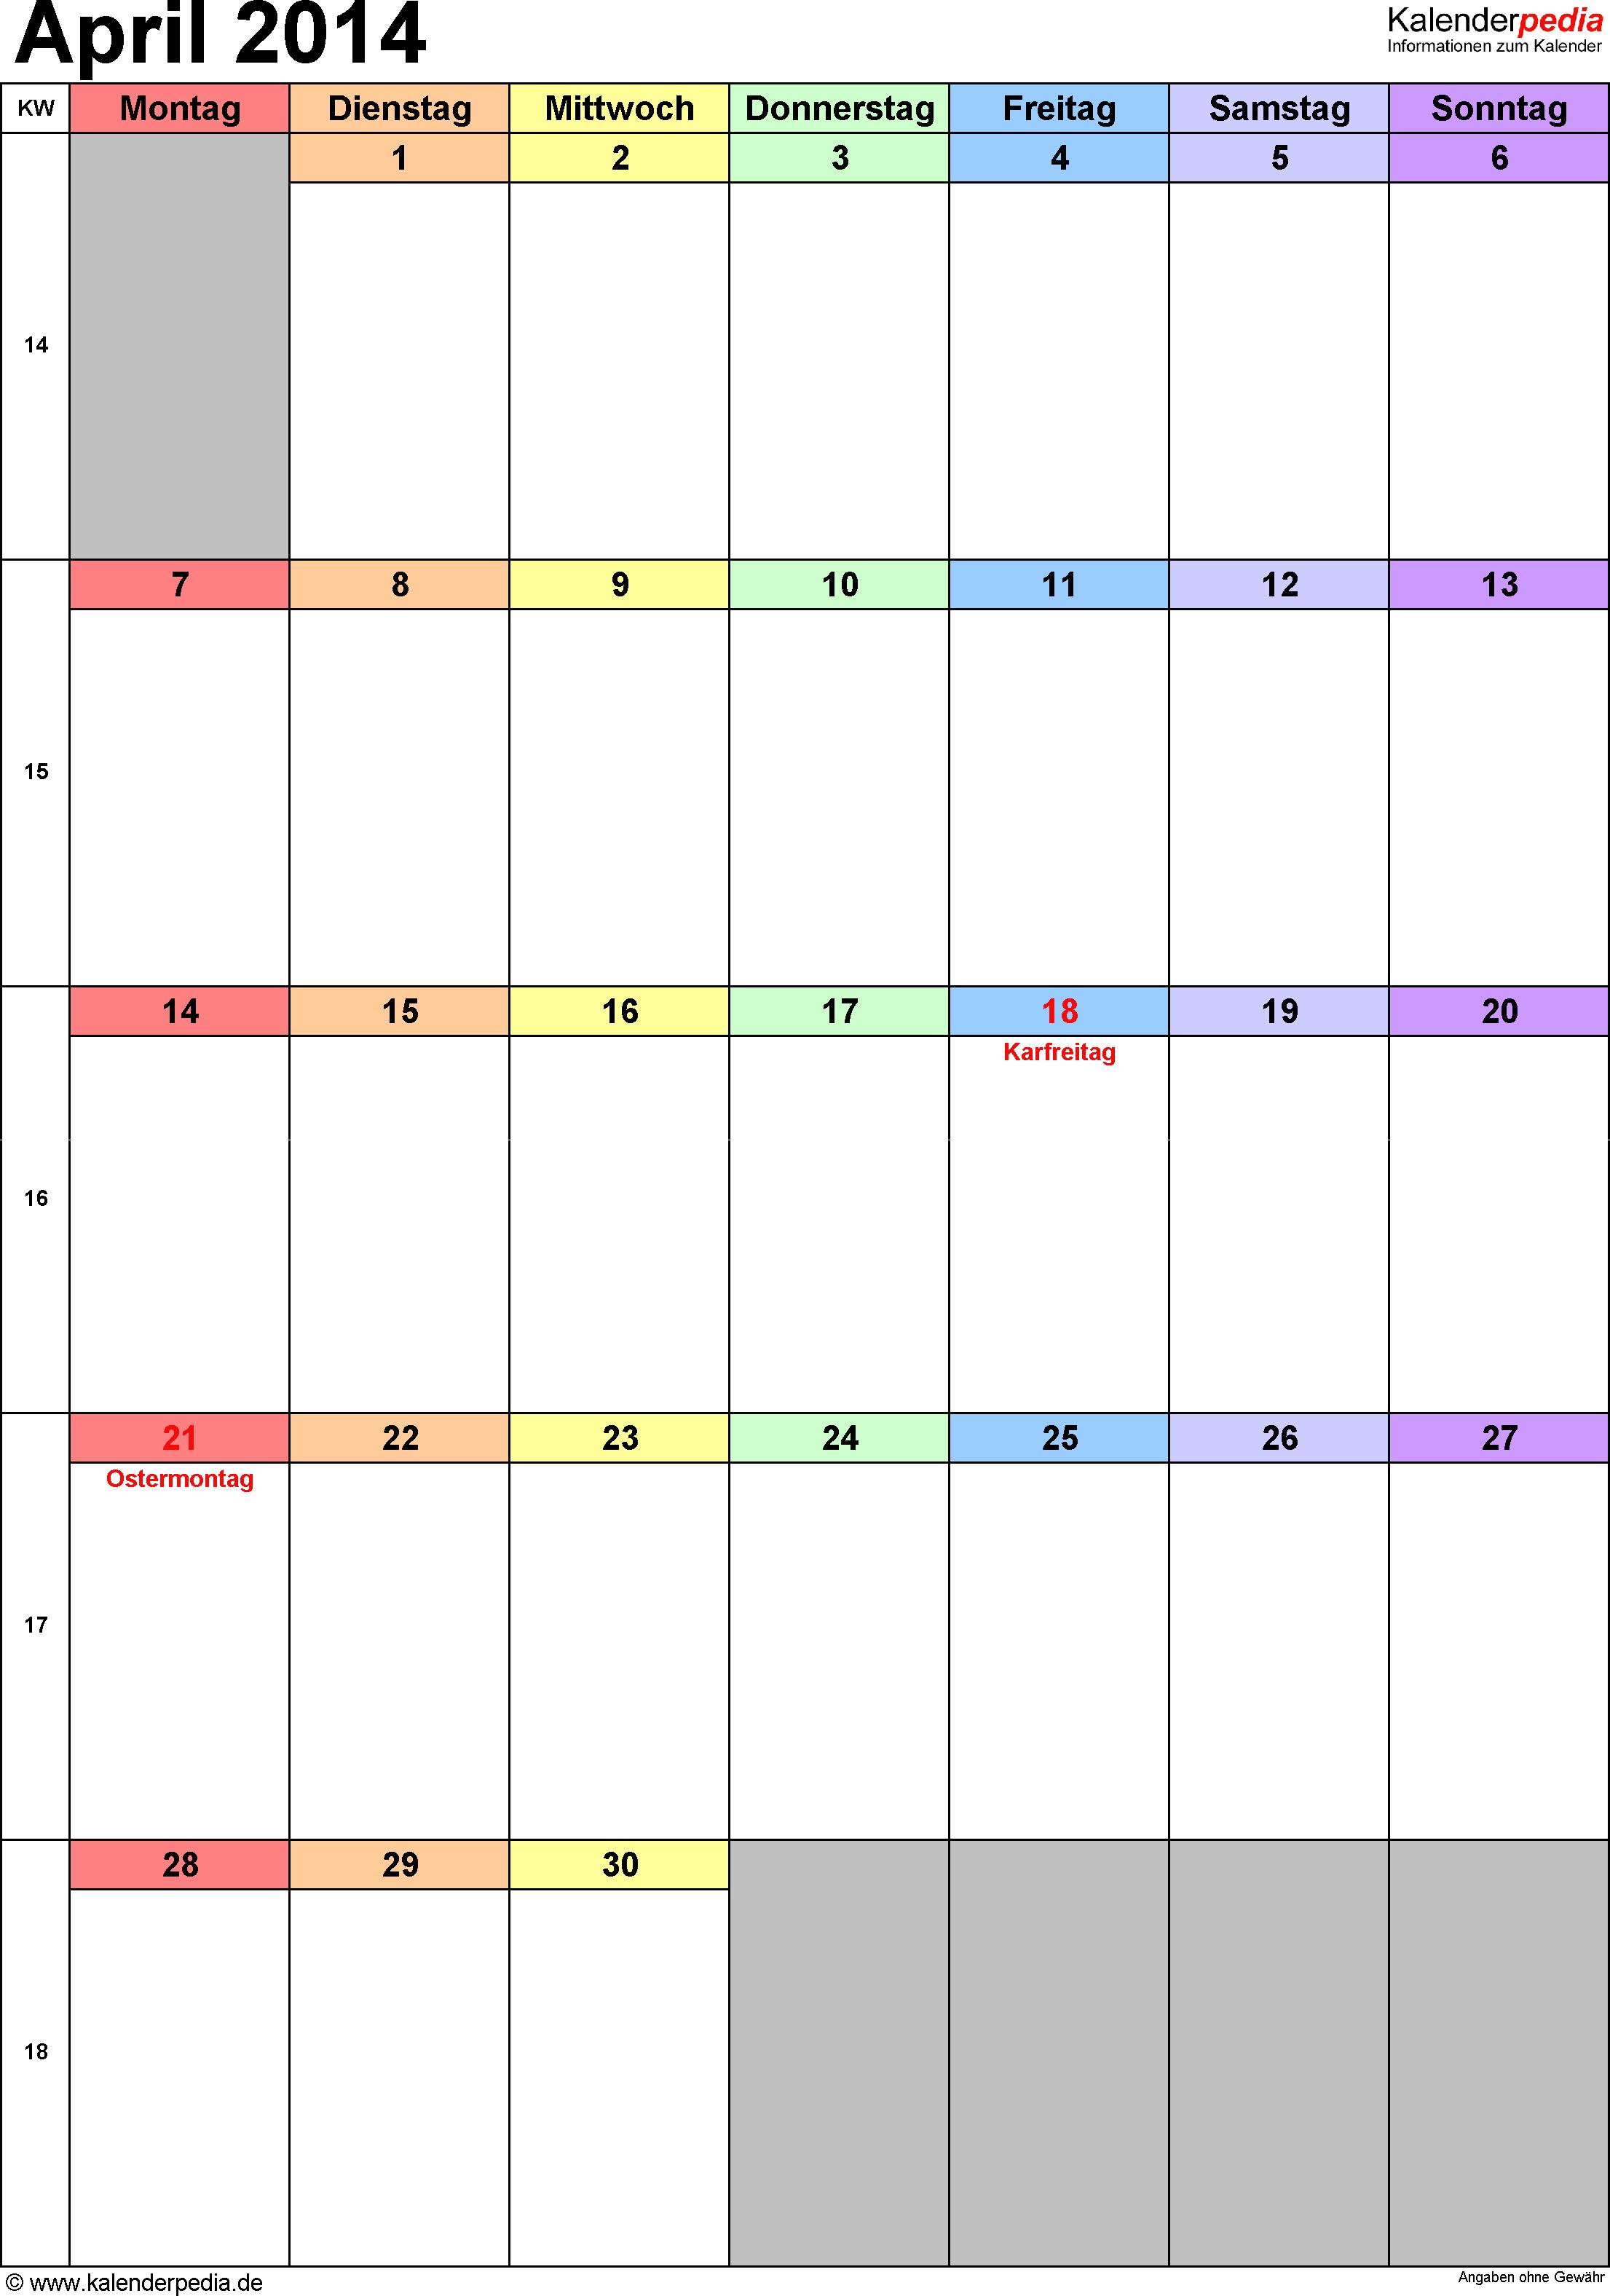 Kalender April 2014 (Hochformat) als Excel-Vorlage